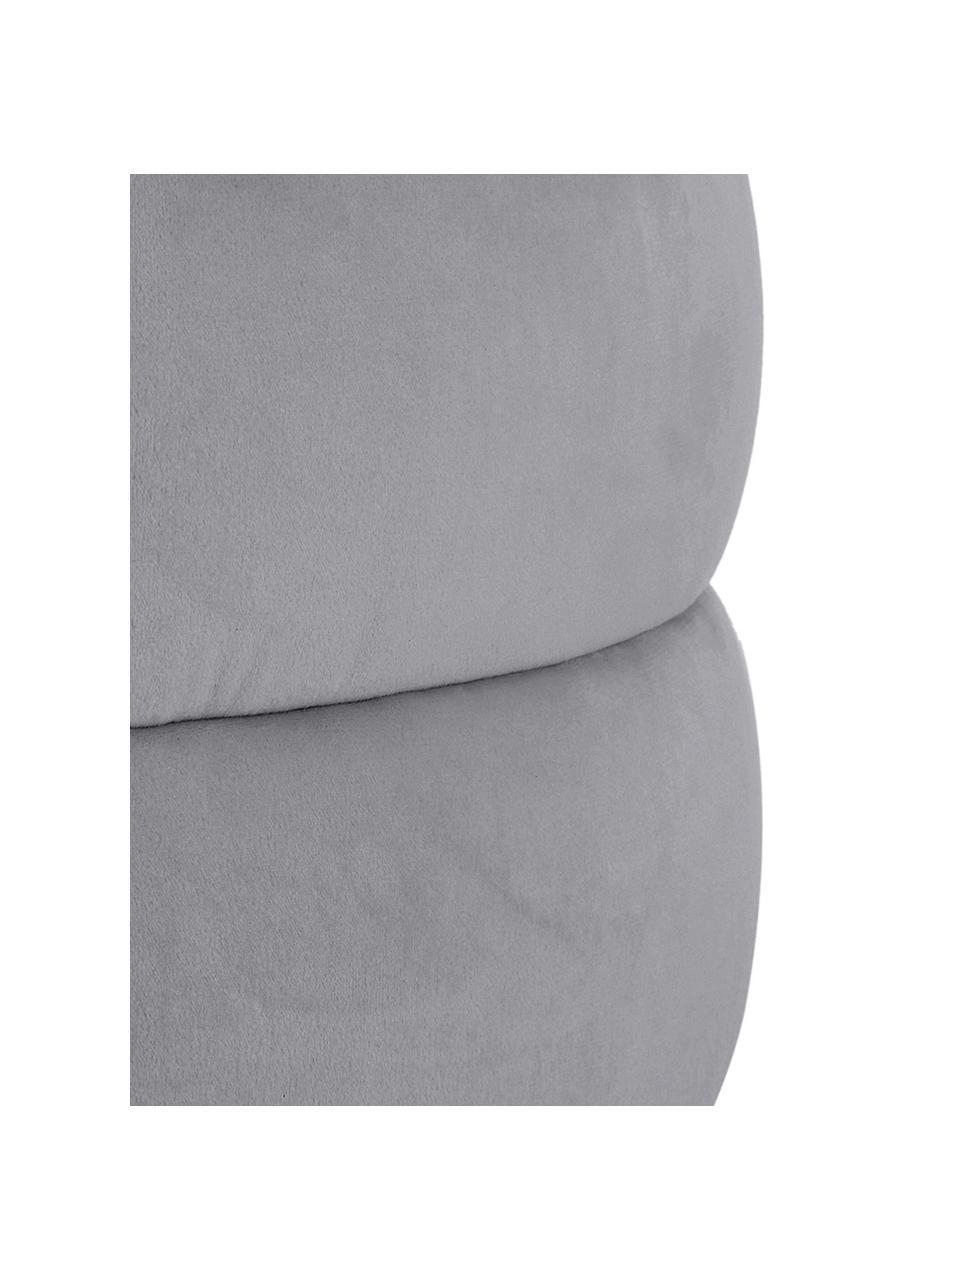 Samt-Hocker Alto, Bezug: Samt (Polyester) Der hoch, Gestell: Sperrholz, Samt Grau, Ø 42 x H 47 cm